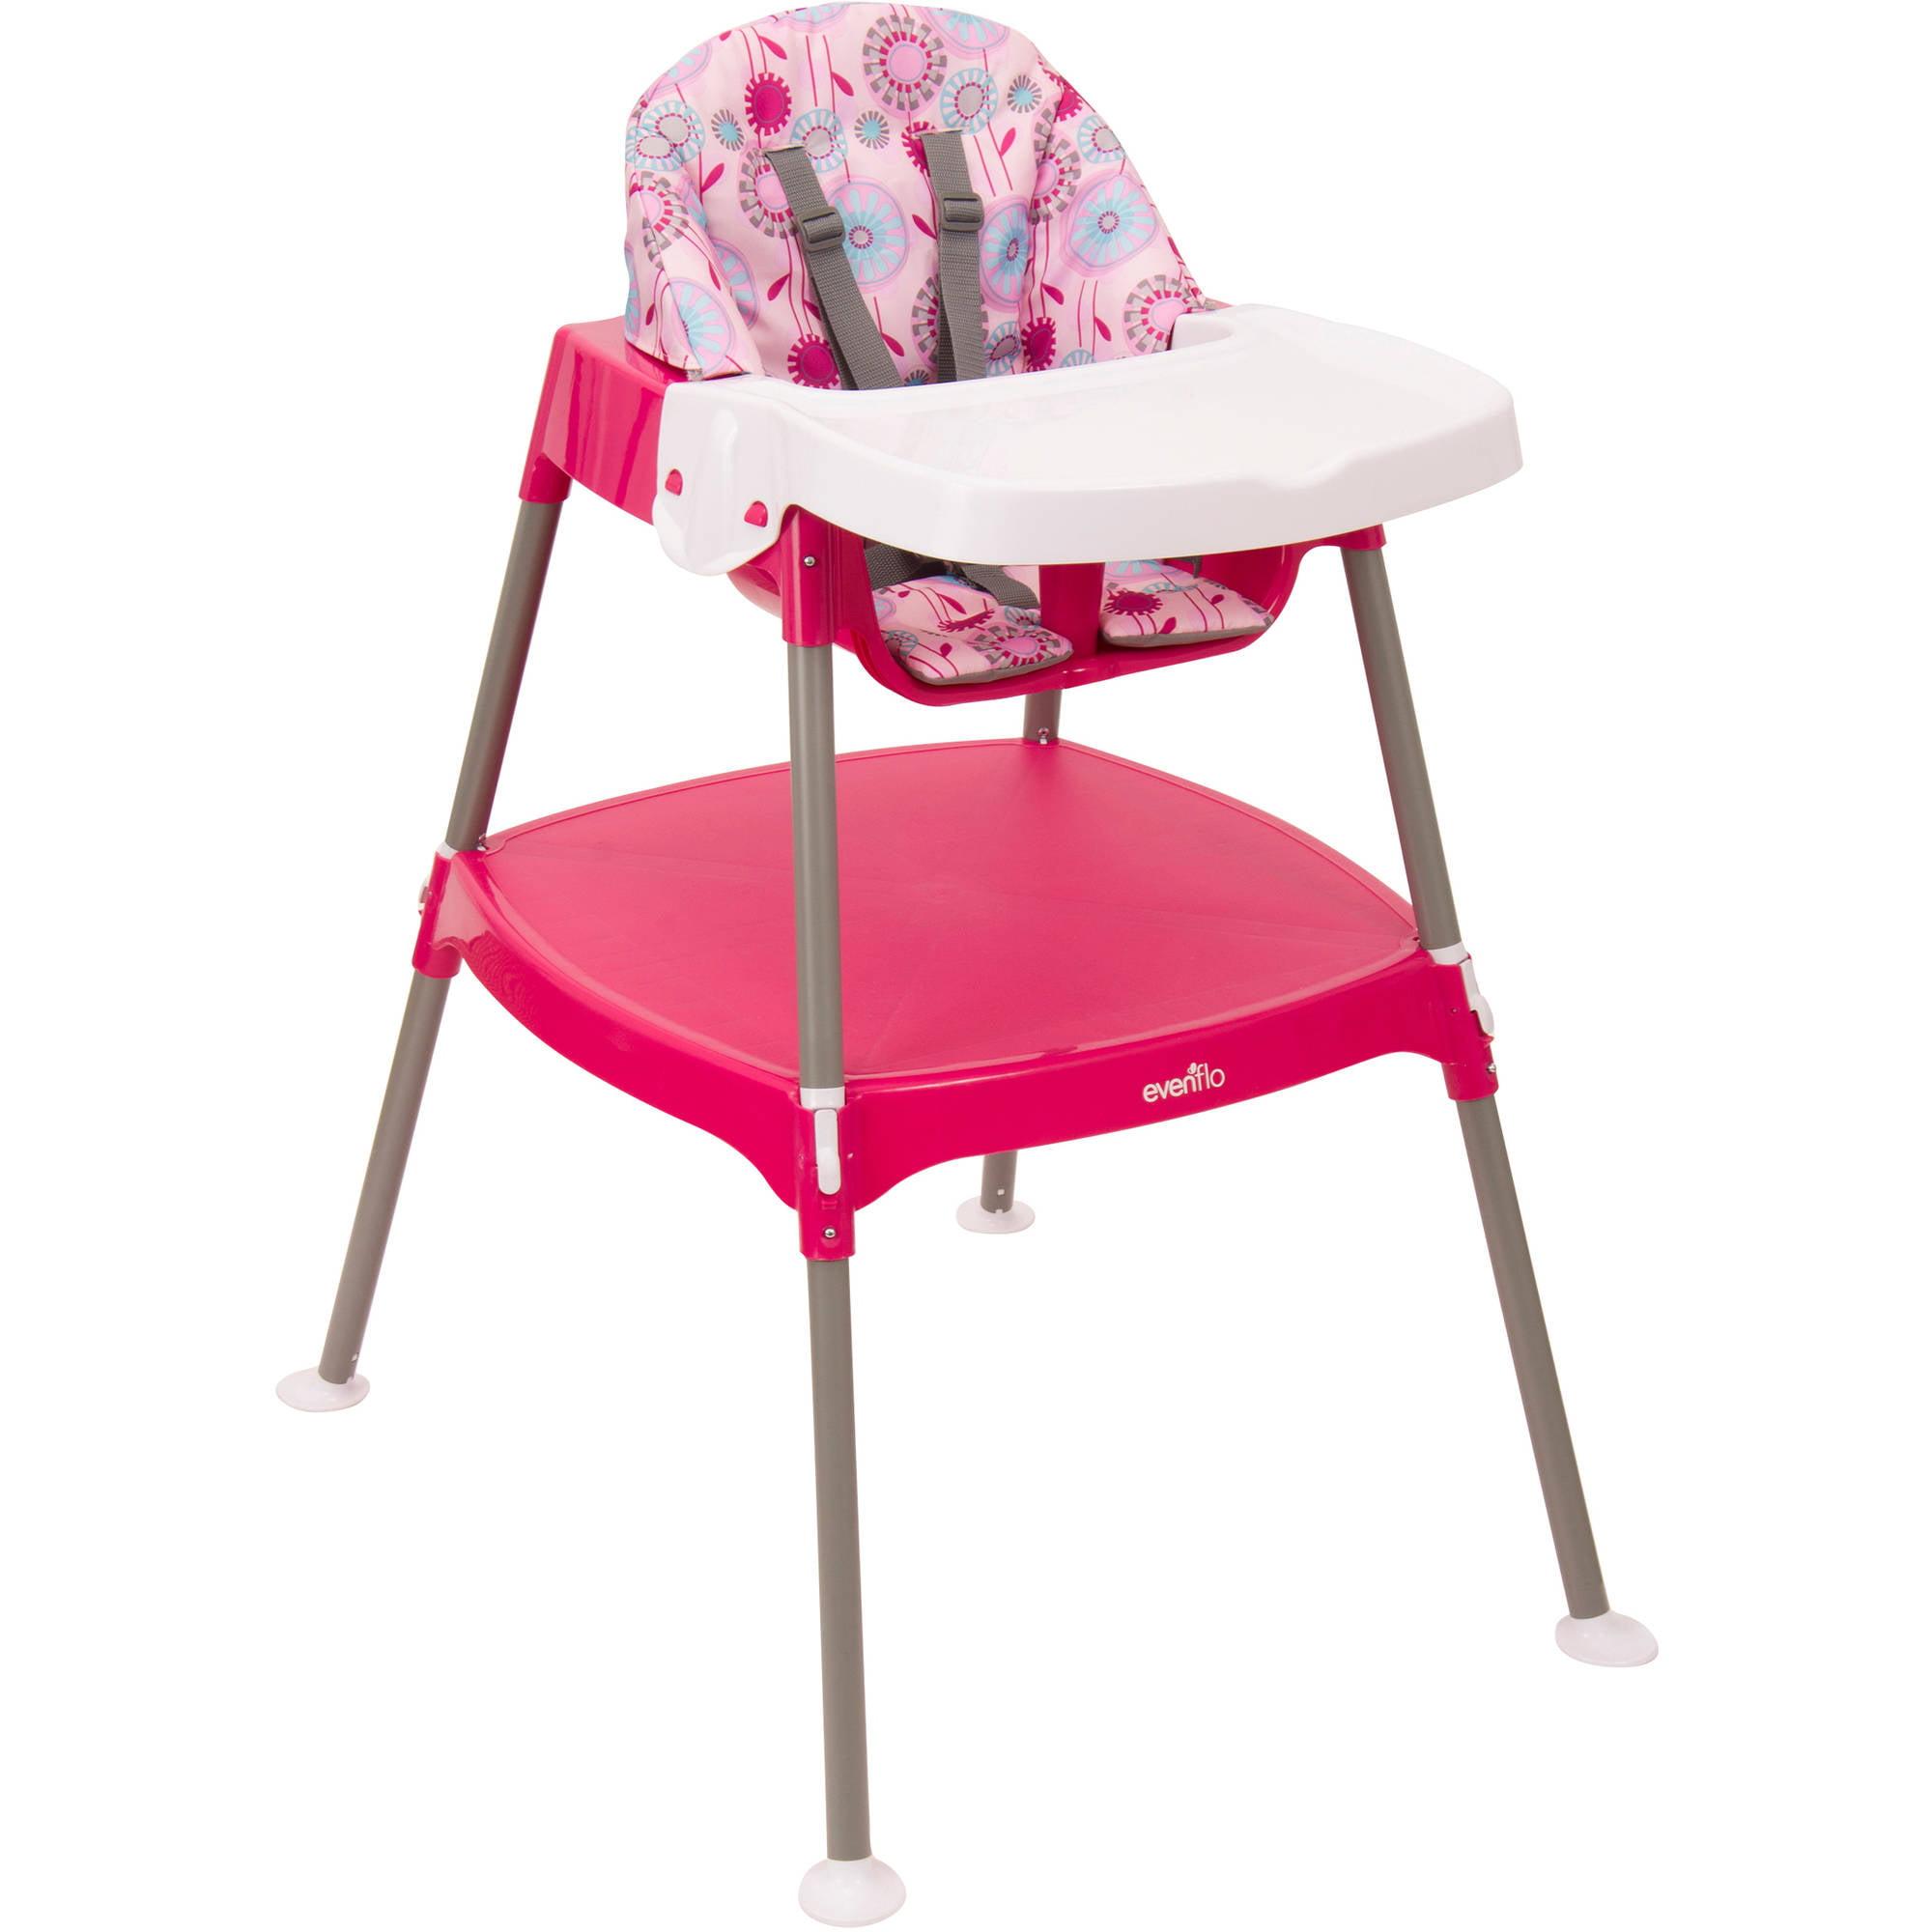 Evenflo Convertible 3-in-1 High Chair, Brianne